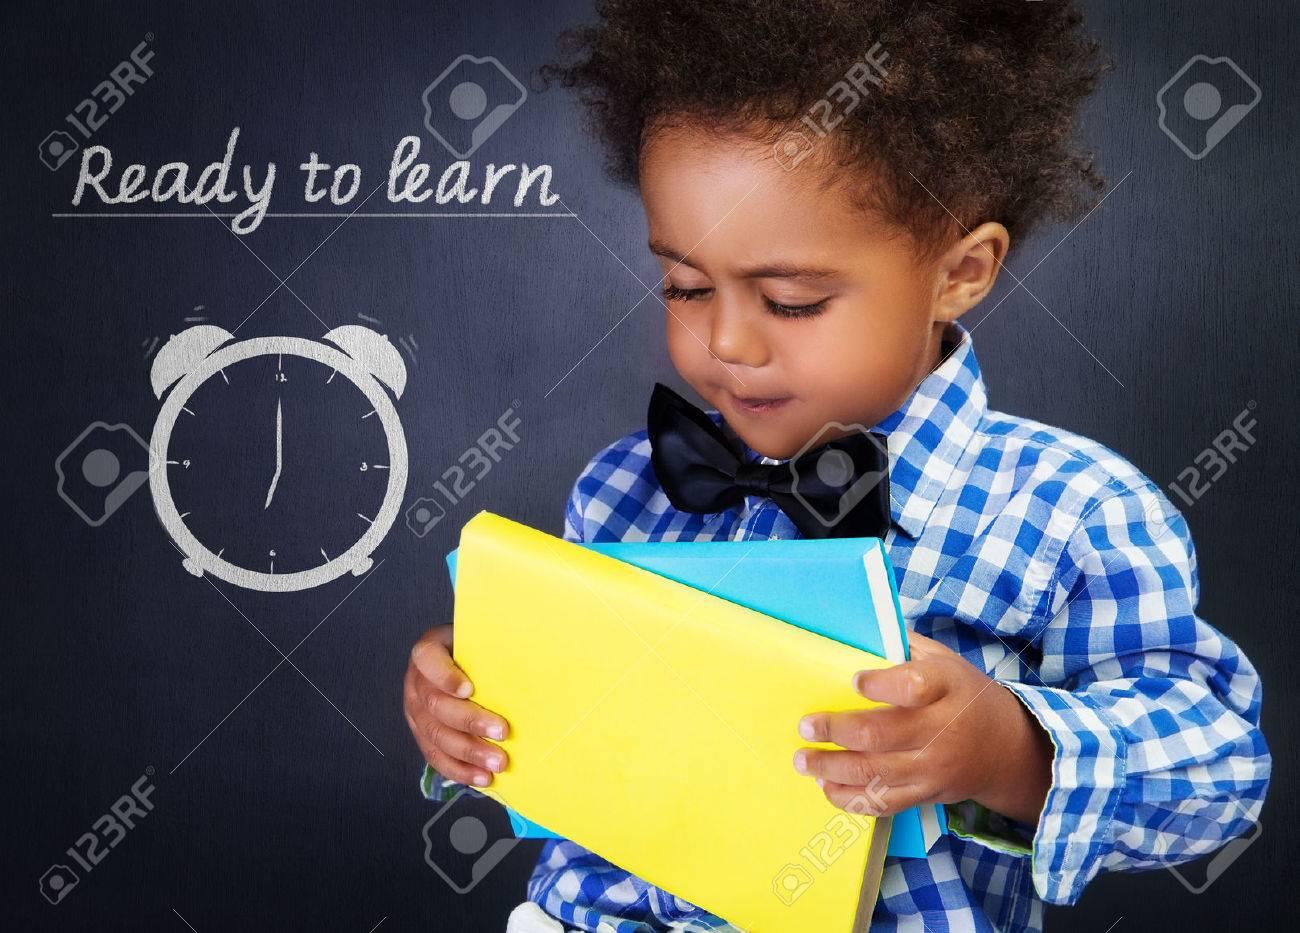 Cute african american boy with books in hands on blackboard background, adorable preschooler ready to learn in elementary school - 44322152